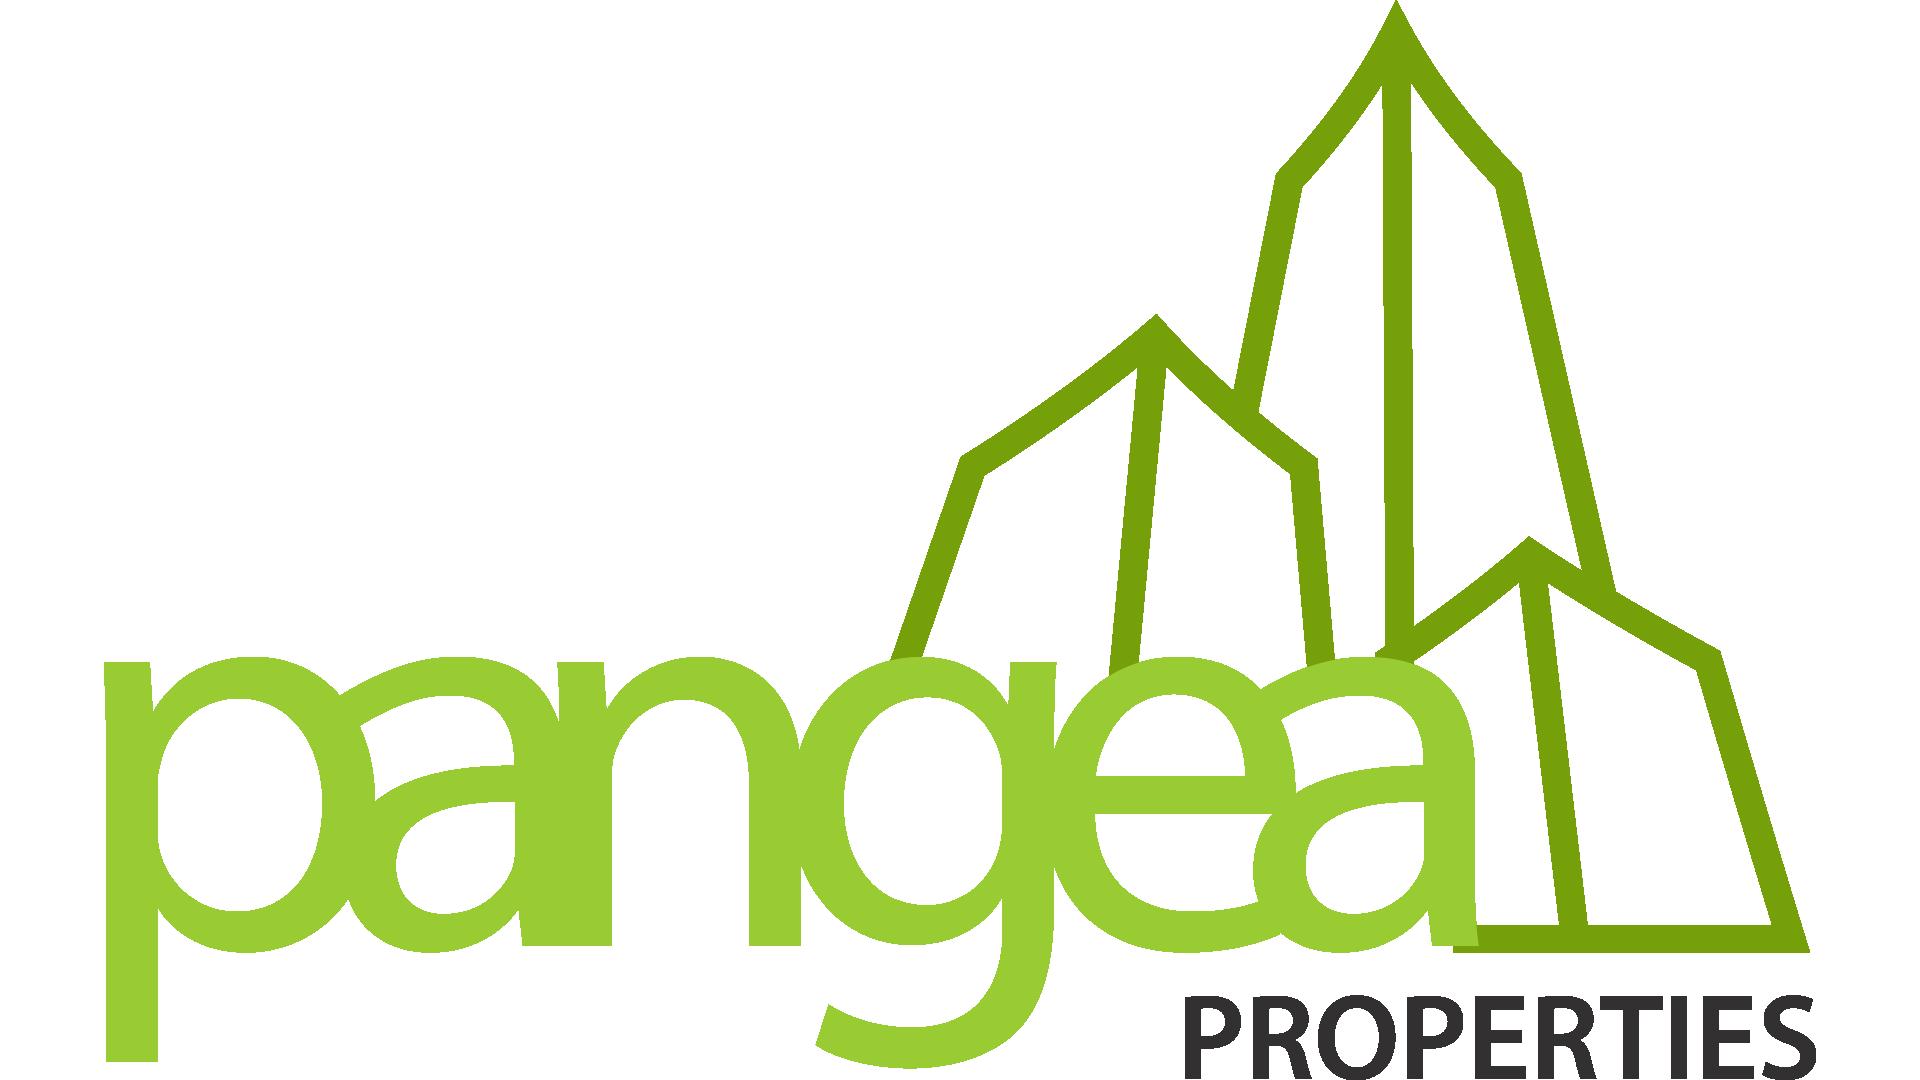 Pangea Properties logo